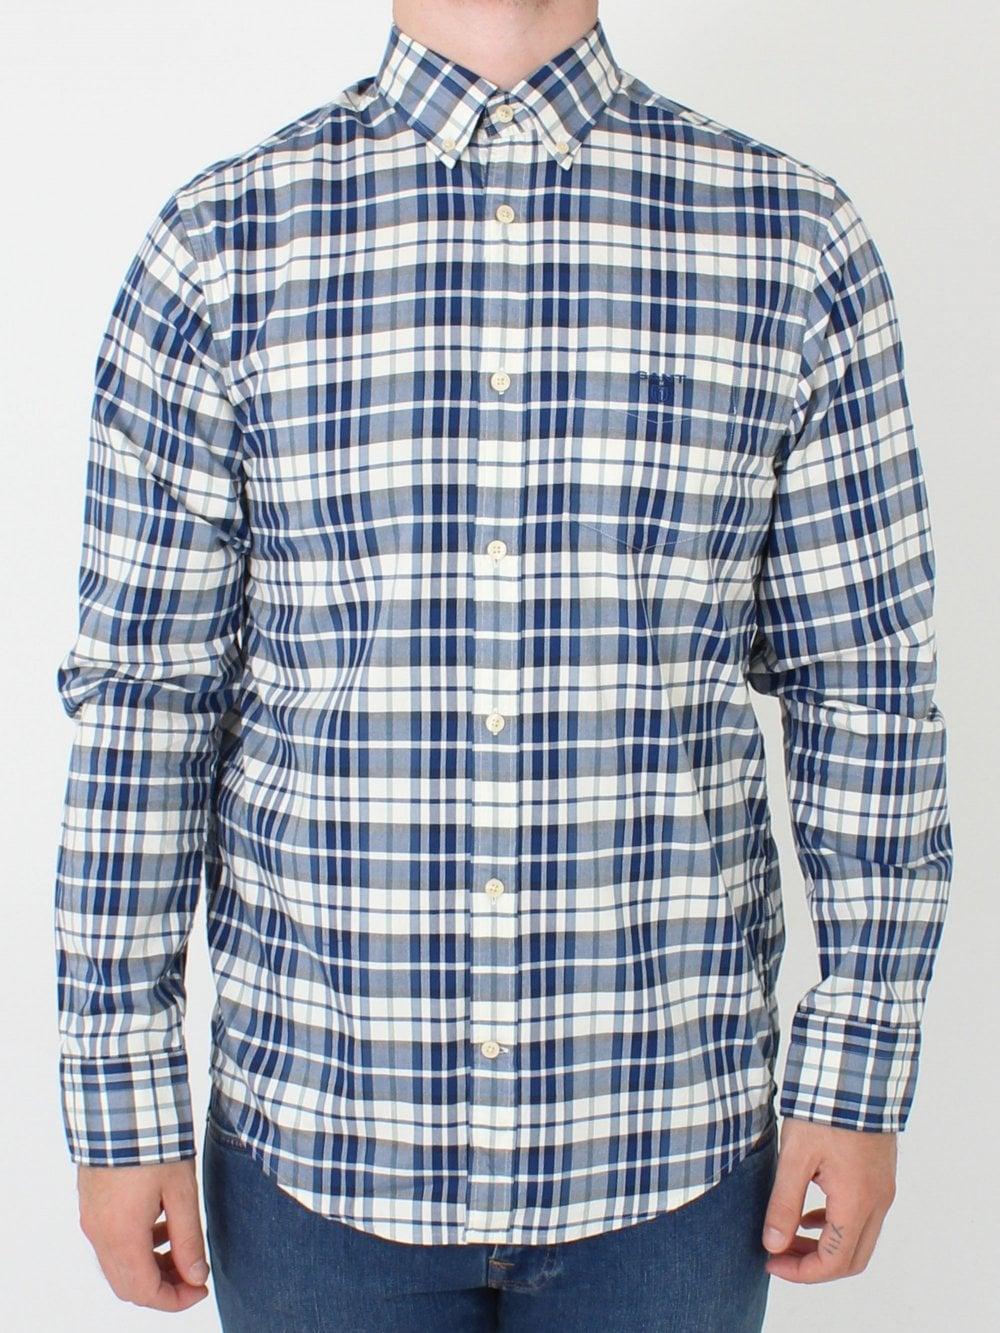 842086ecbec GANT Winter Twill Plaid Shirt in Cream | Northern Threads